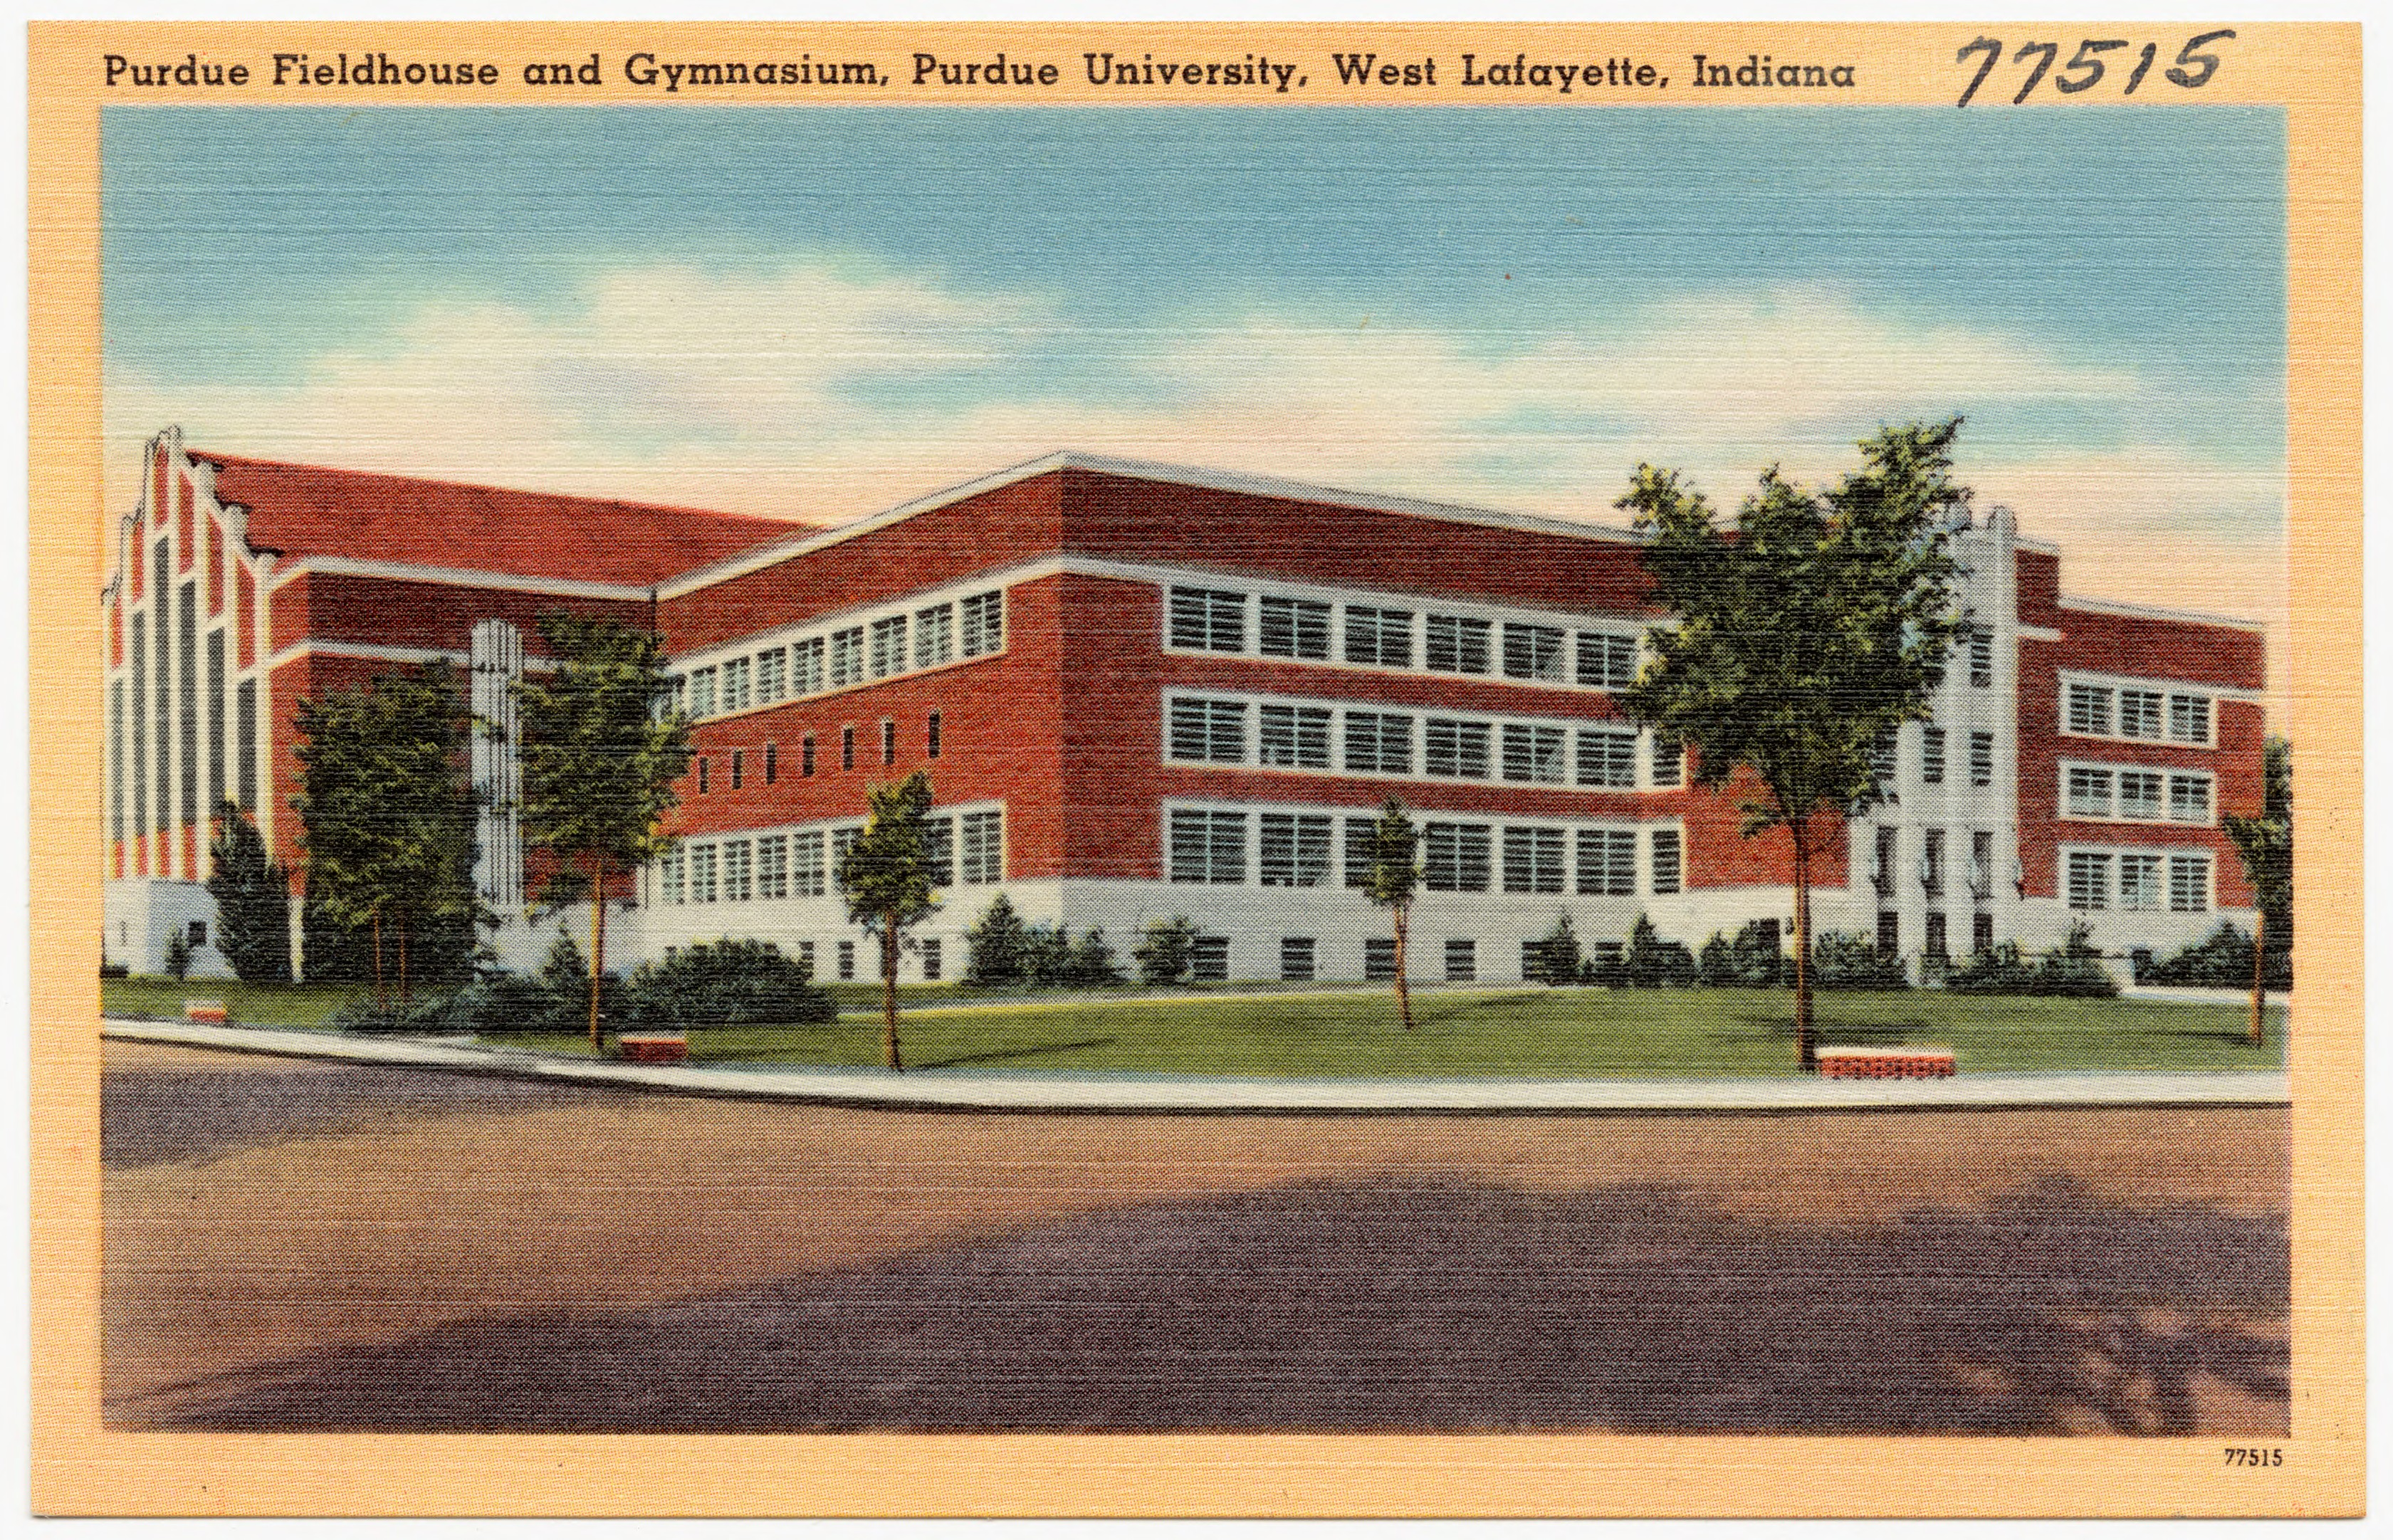 filepurdue fieldhouse and gymnasium purdue university west lafayette indiana 77515